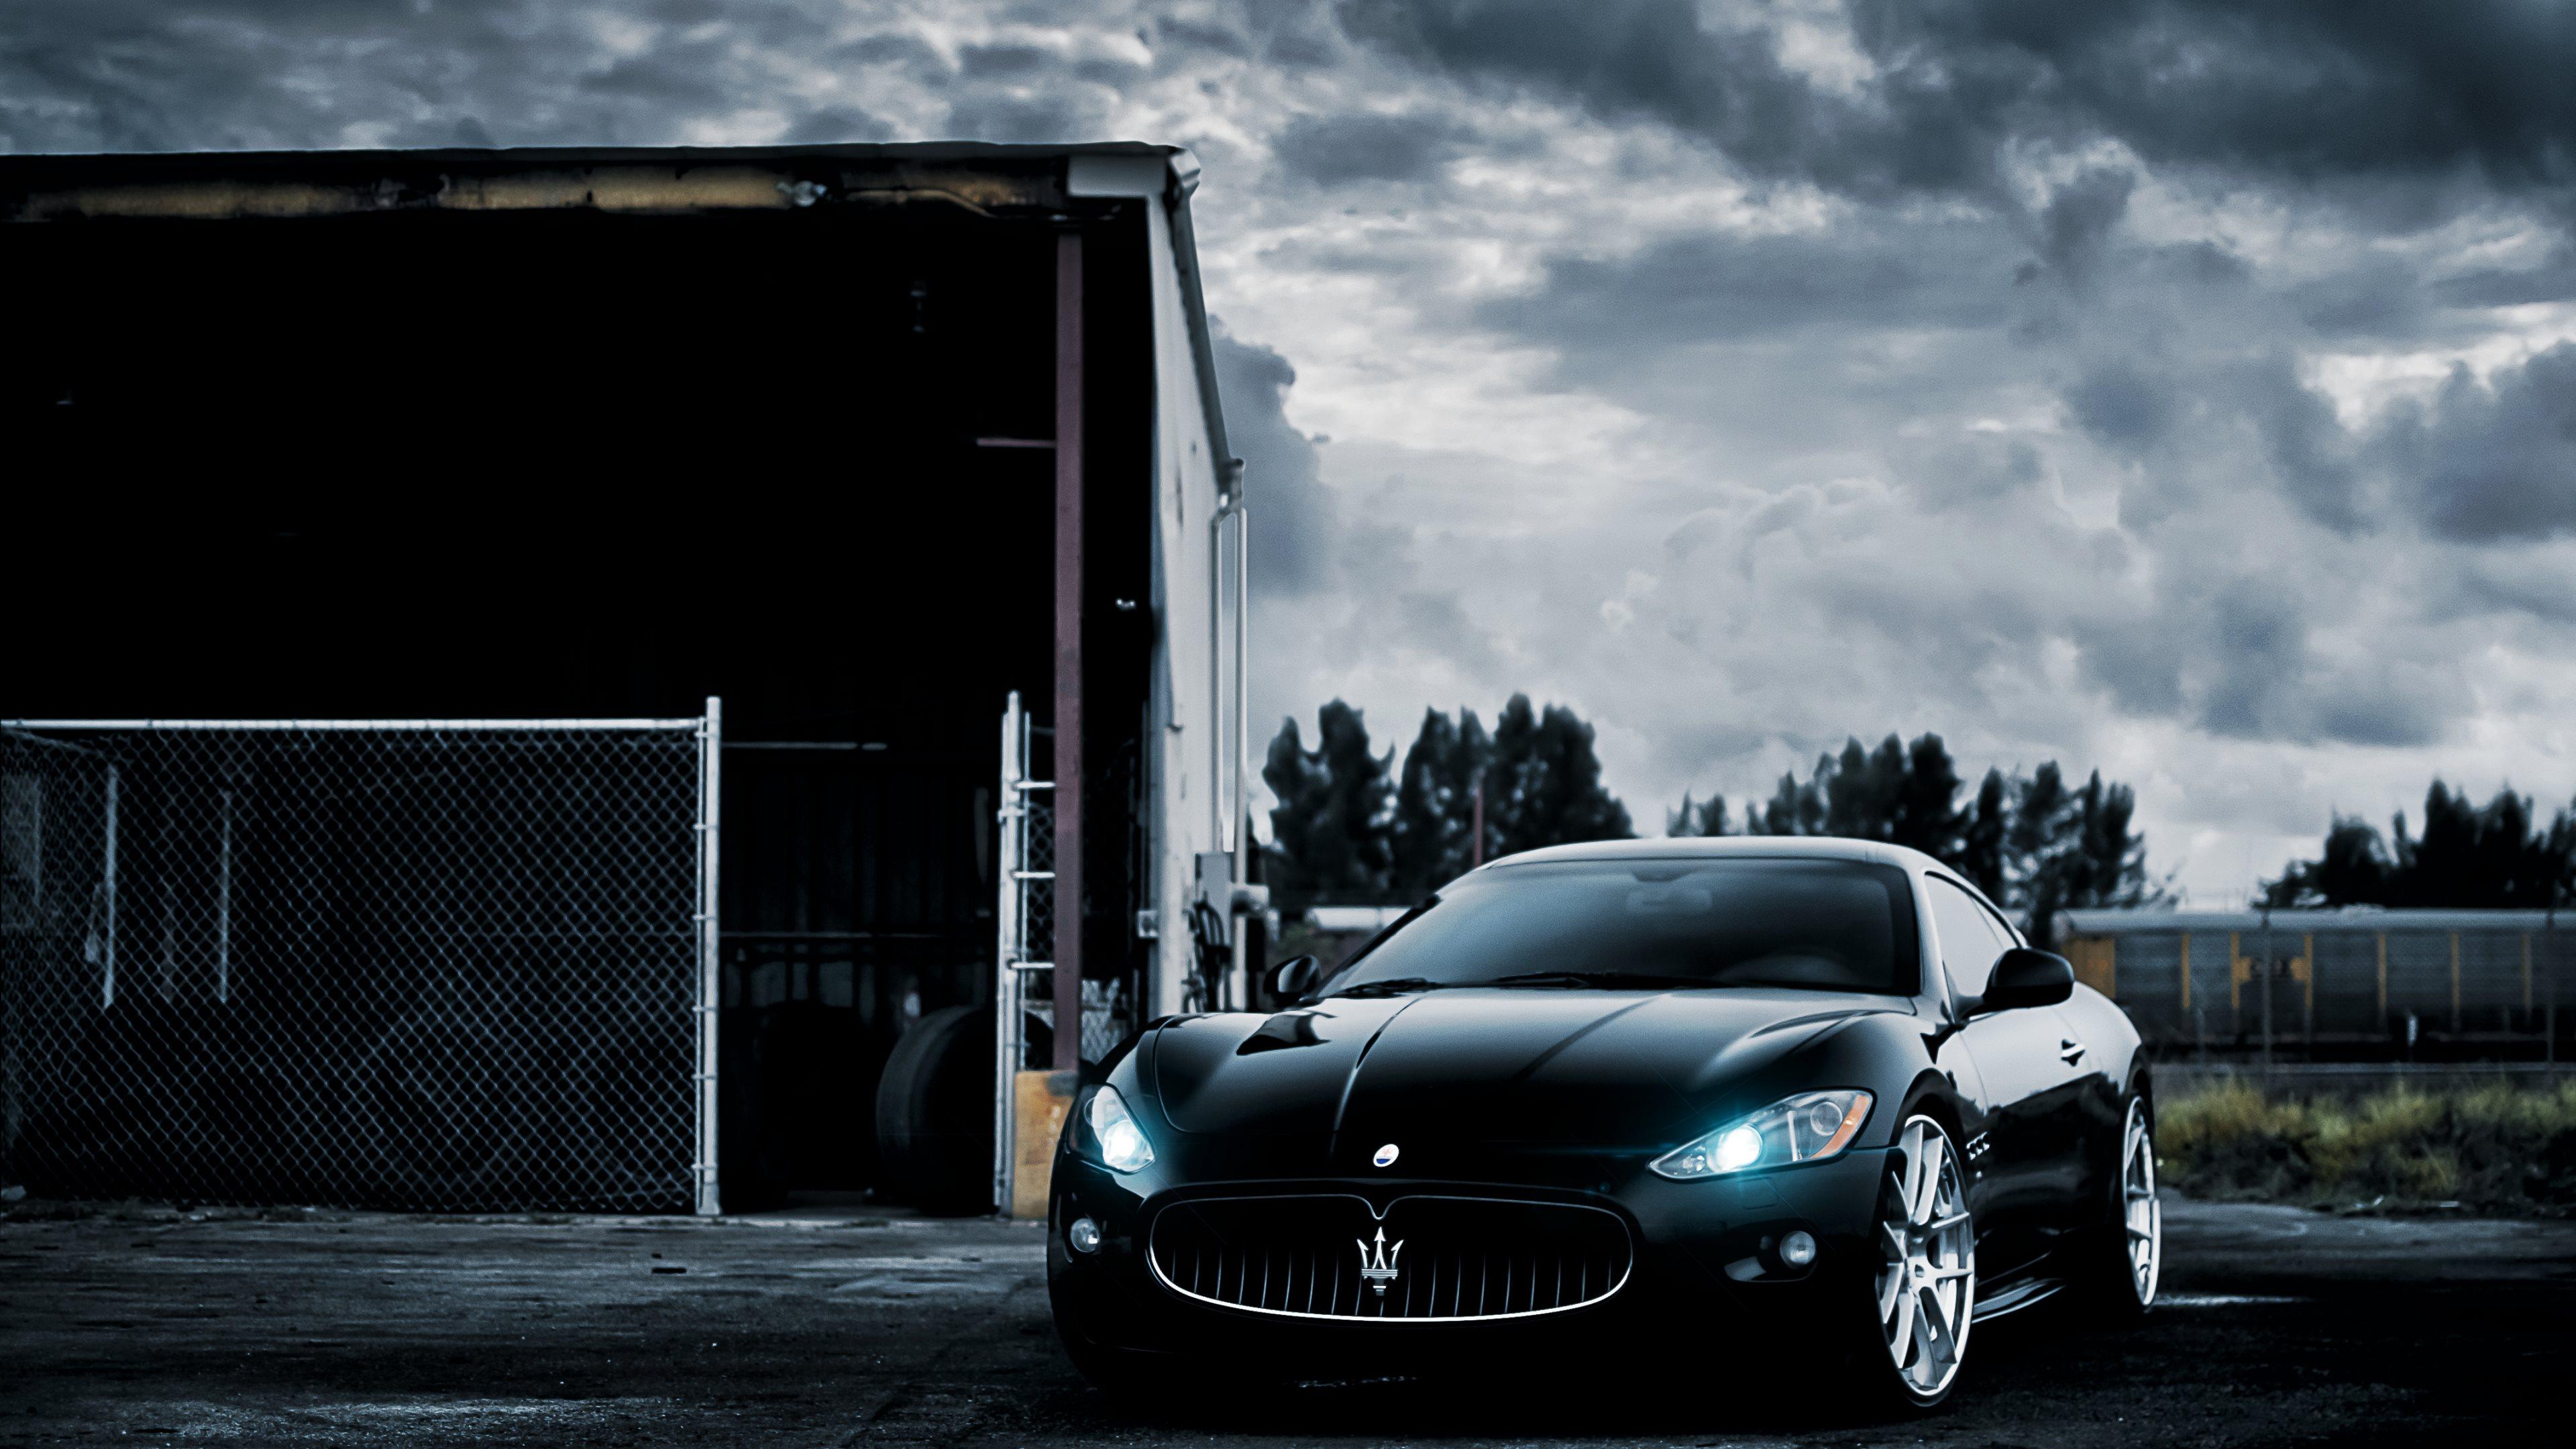 Maserati Wallpaper 12   3840 X 2160 stmednet 3840x2160